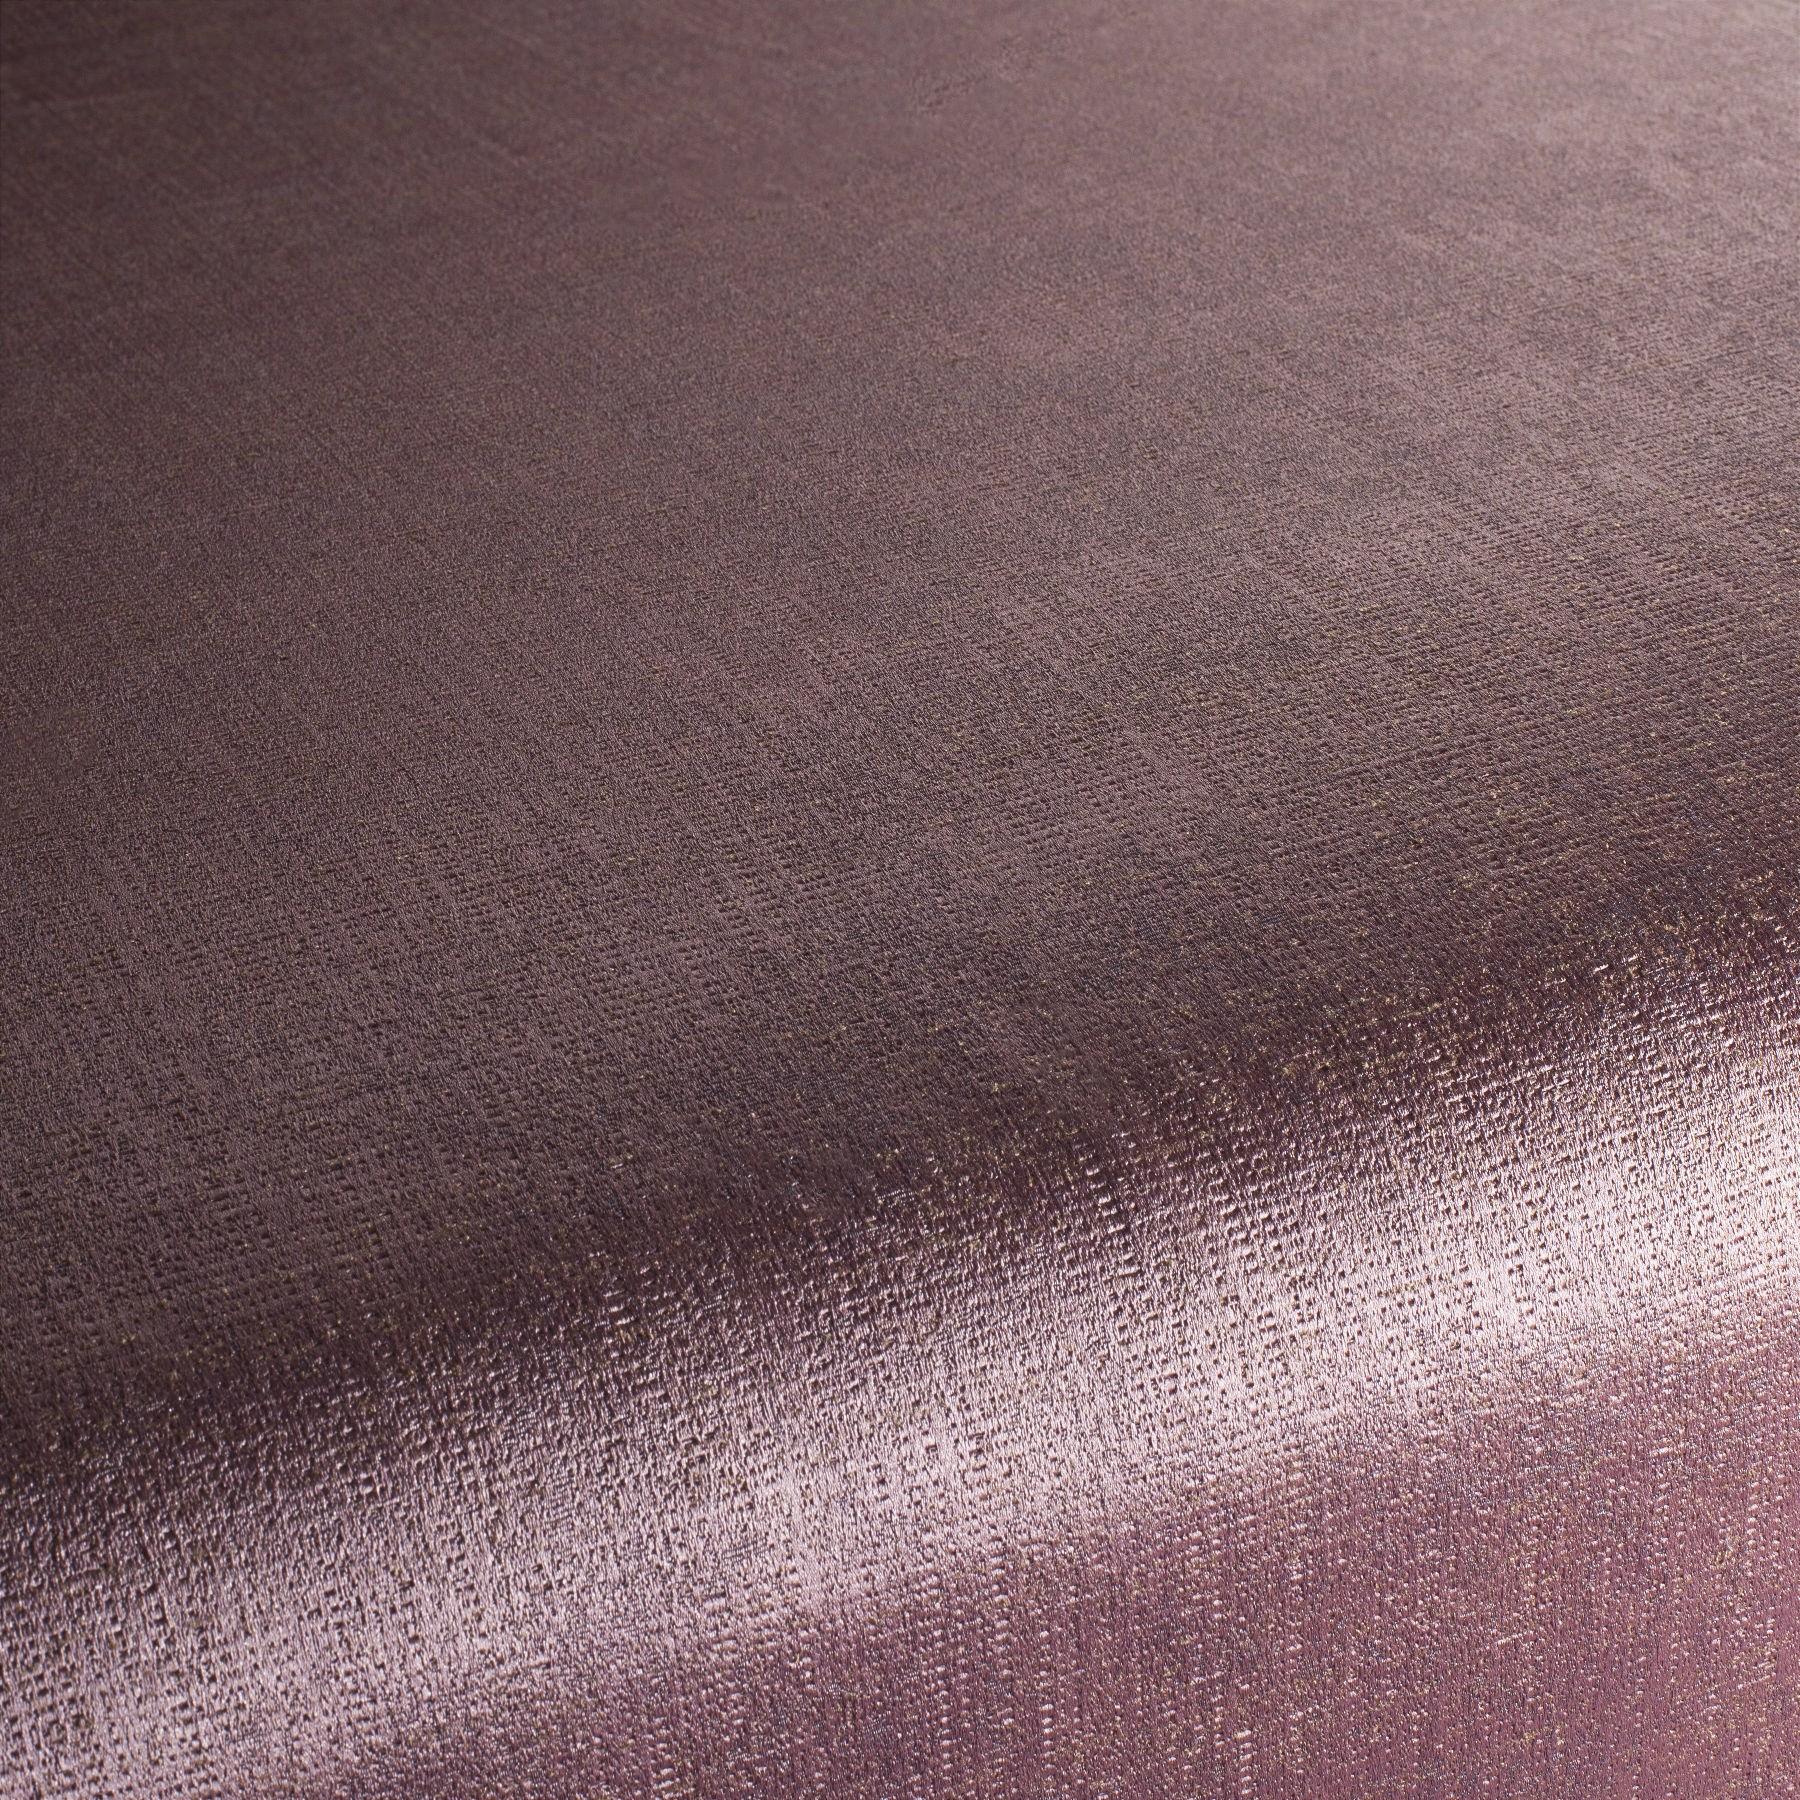 Upholstery Fabric Eaton Square 1 1350 060 Jab Anstoetz Fabrics